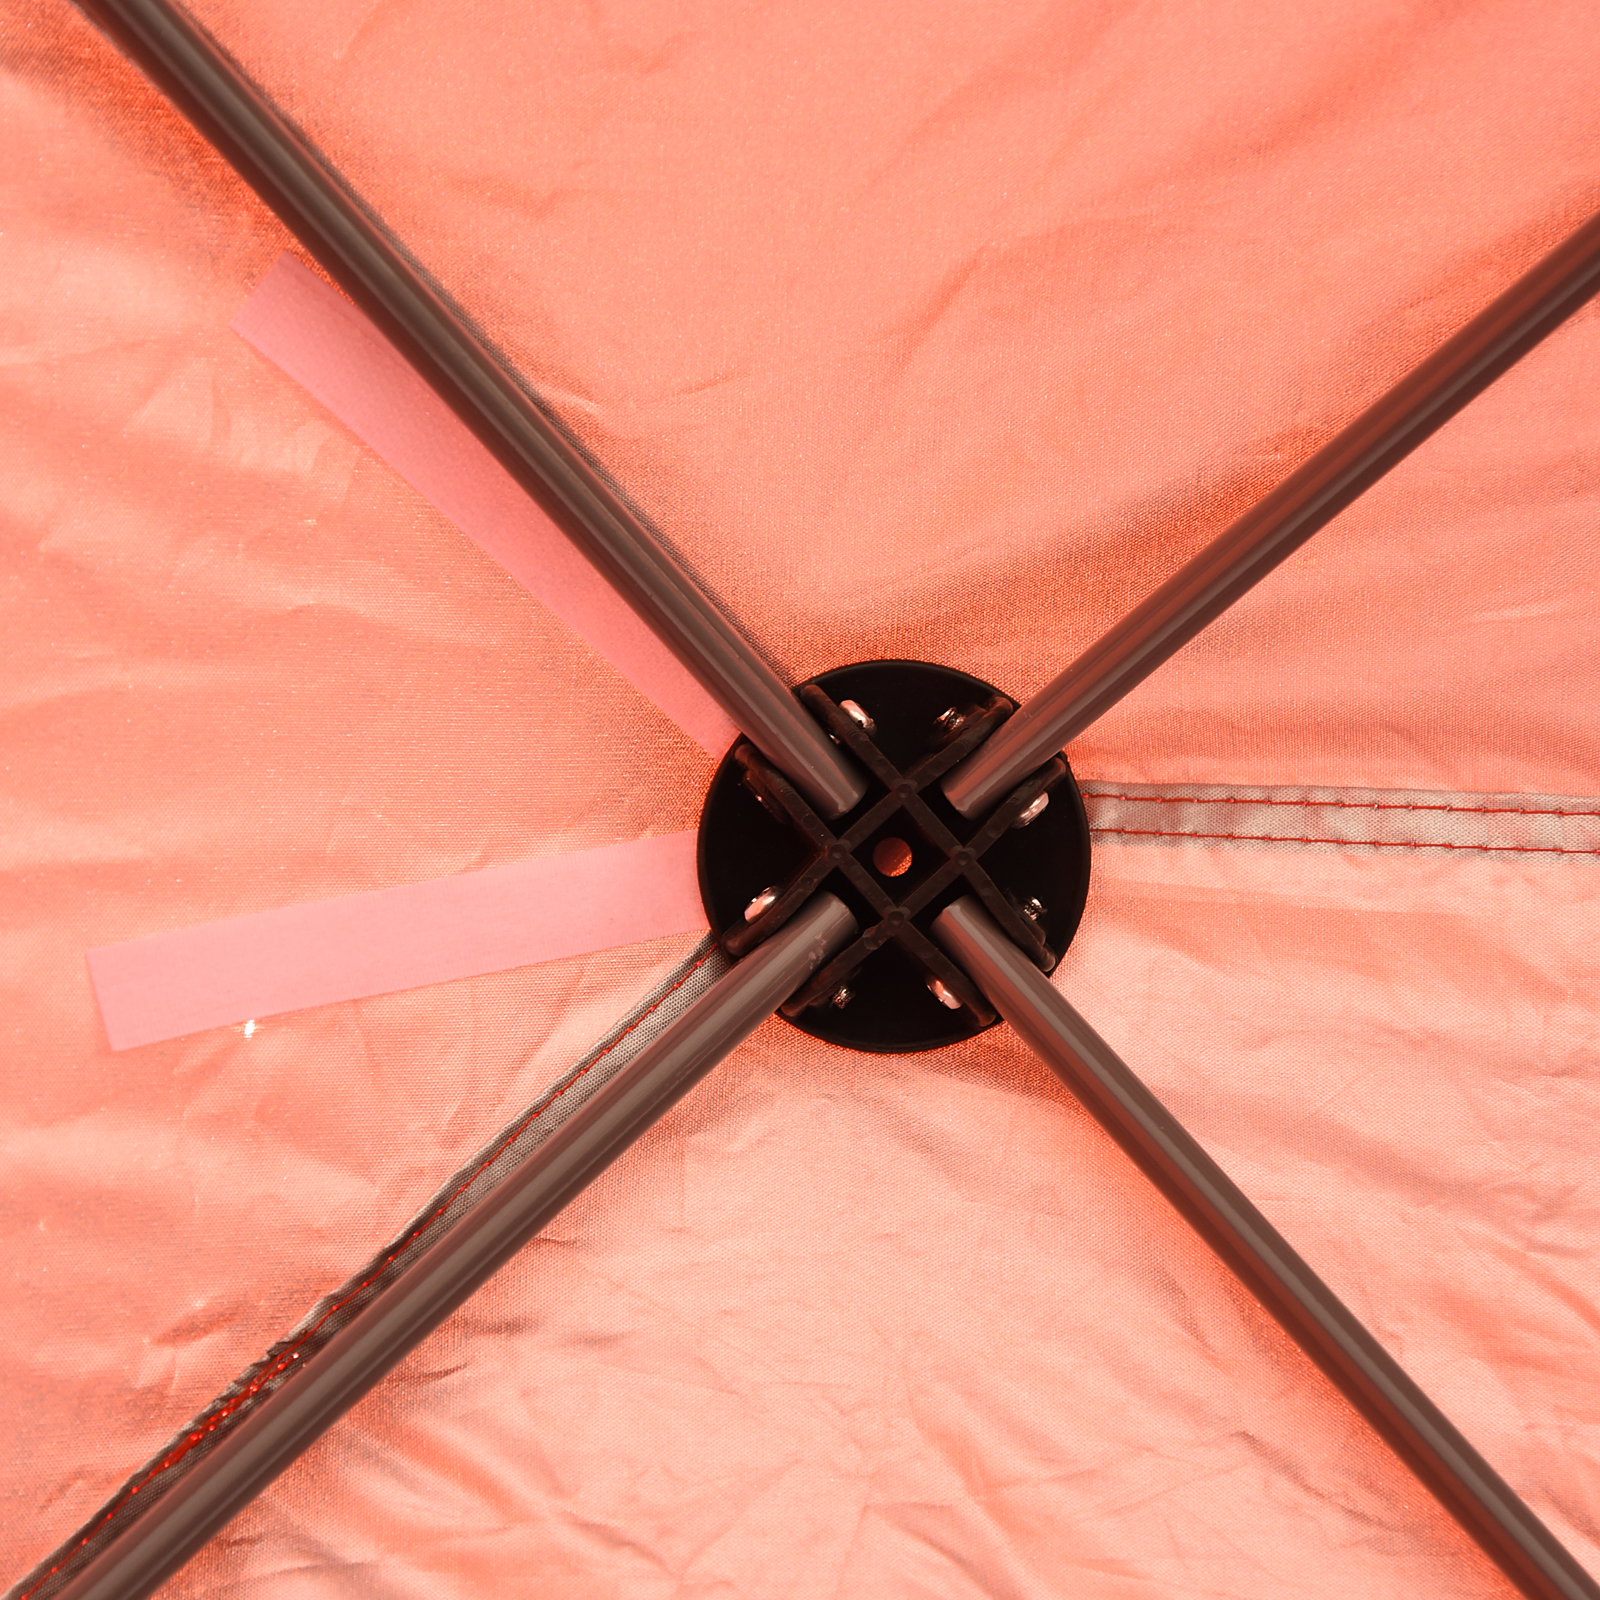 Outdoor-10-039-x20-039-EZ-POP-UP-Gazebo-Wedding-Party-Tent-Canopy-Folding-w-Carry-Bag thumbnail 41